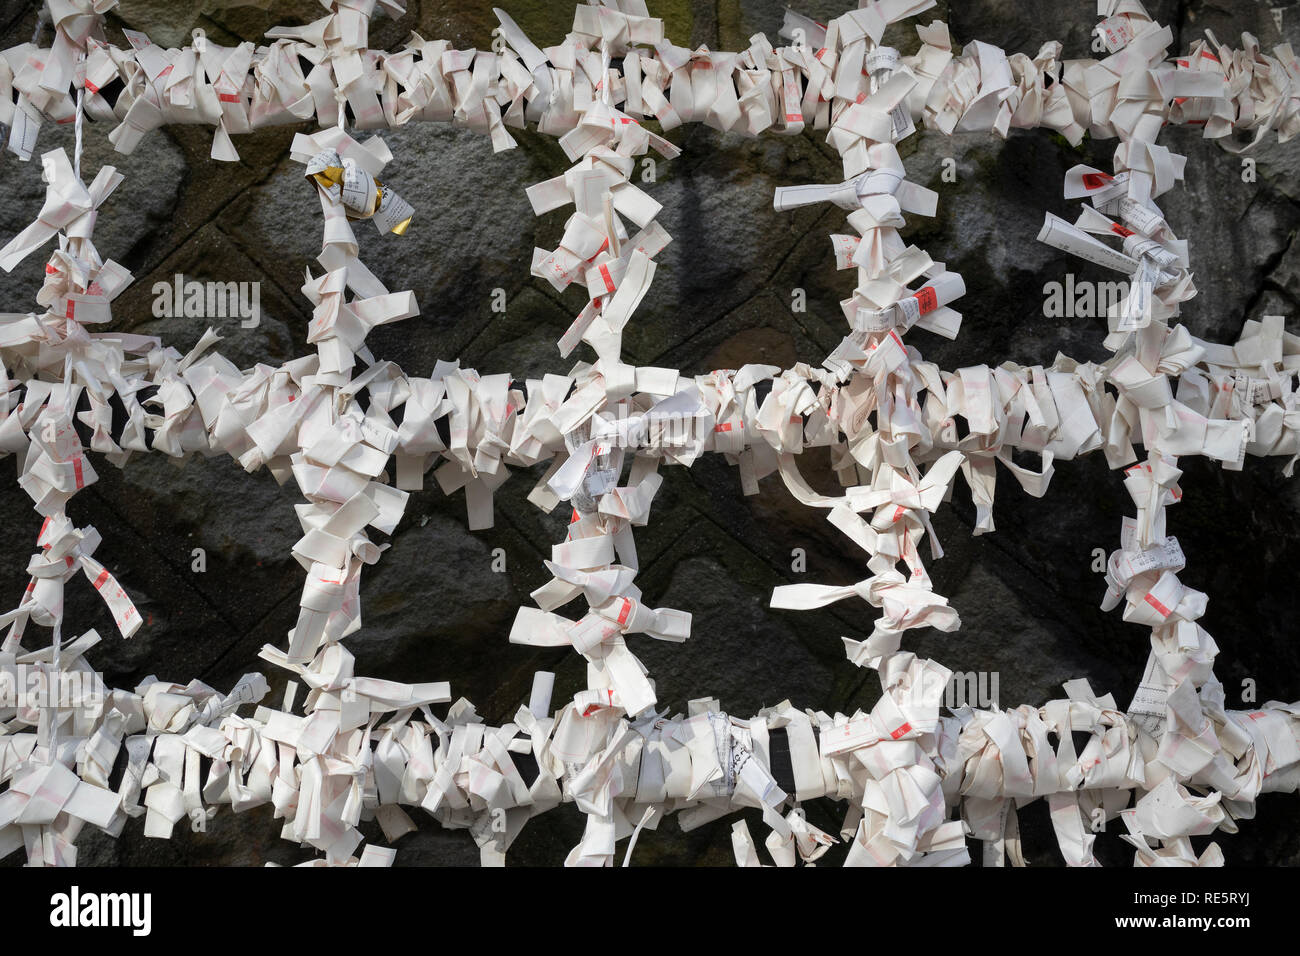 Kumamoto, Japan - November 13, 2018: Many Omikuji, fortune telling paper slips at the Kumamoto jo Inari shrine - Stock Image